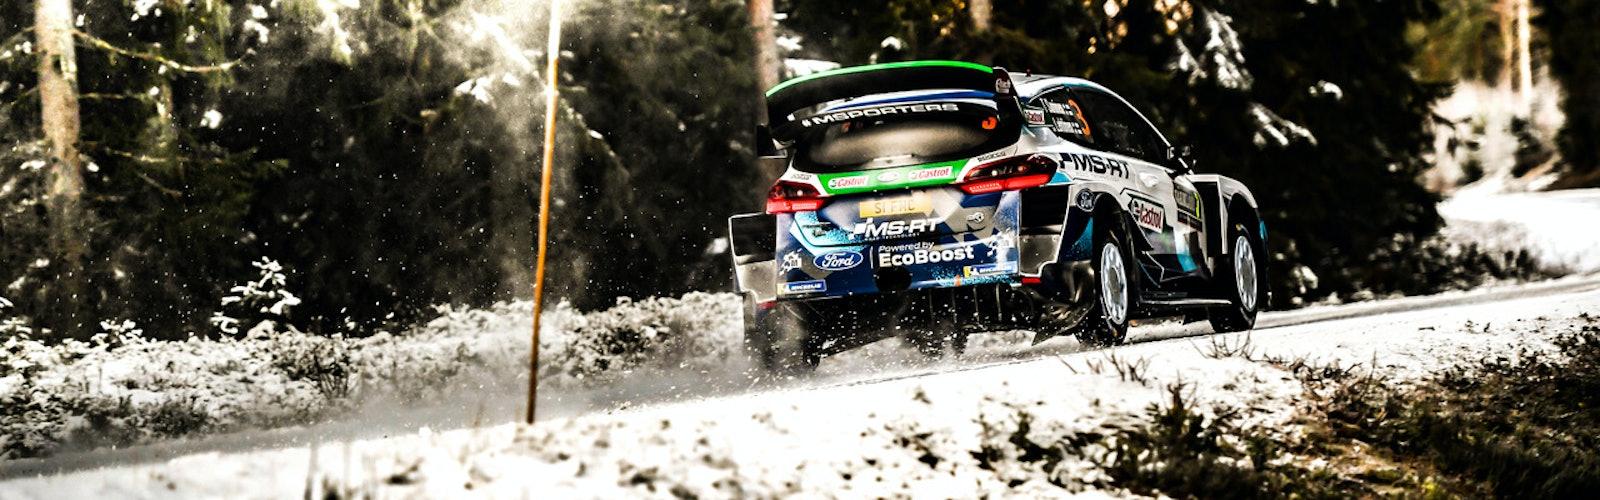 Teemu Suninen M-Sport Ford WRC Rally Sweden 2020